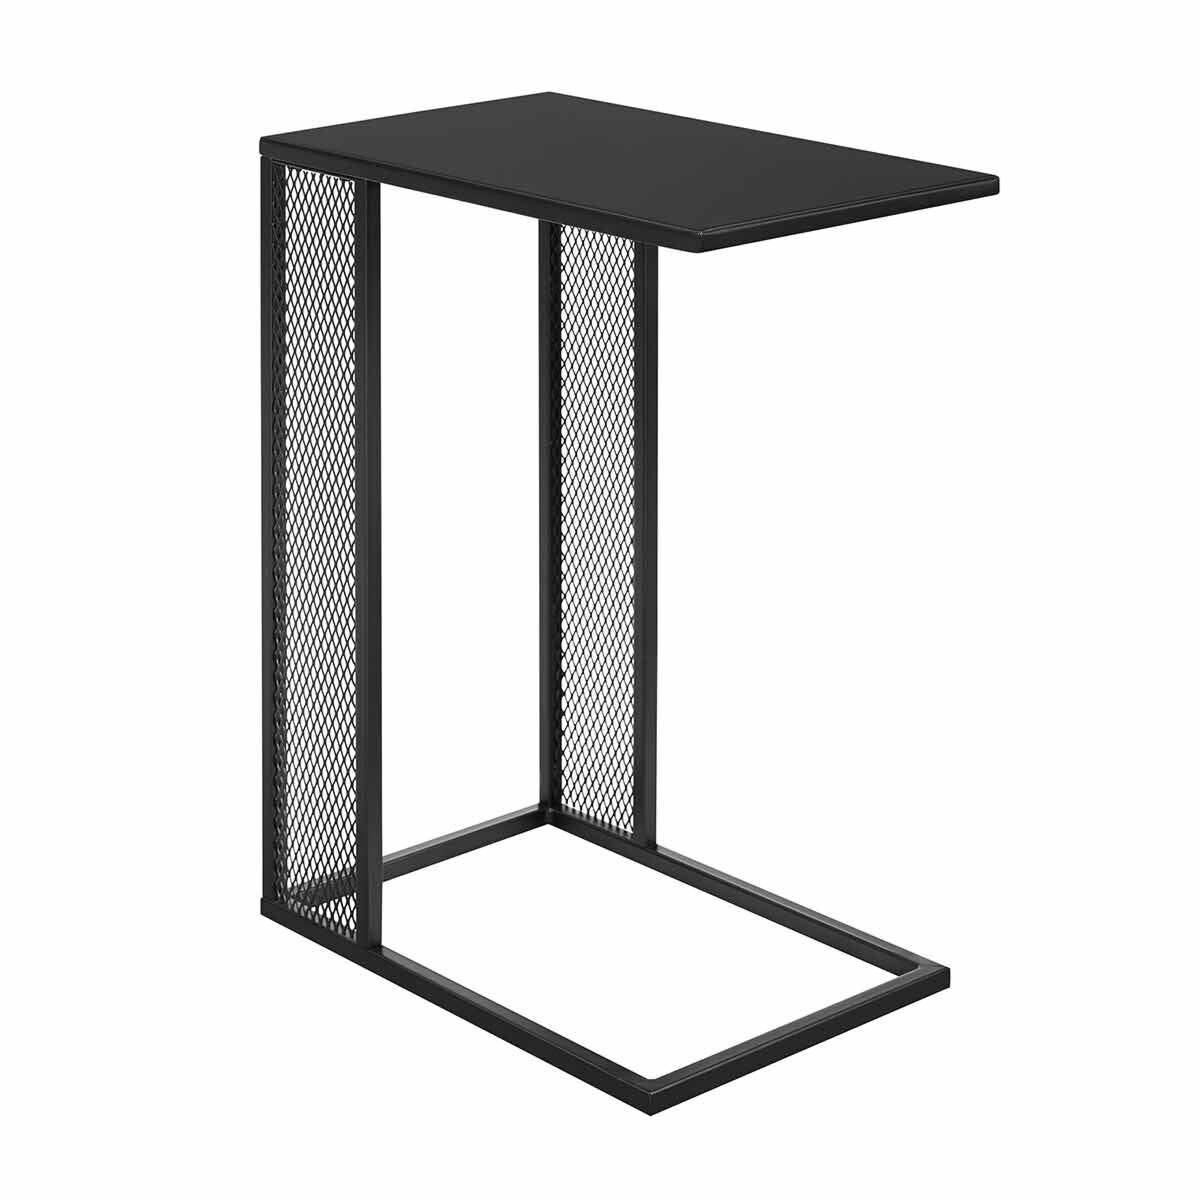 Seville Rectangle Metal Mesh C-Table